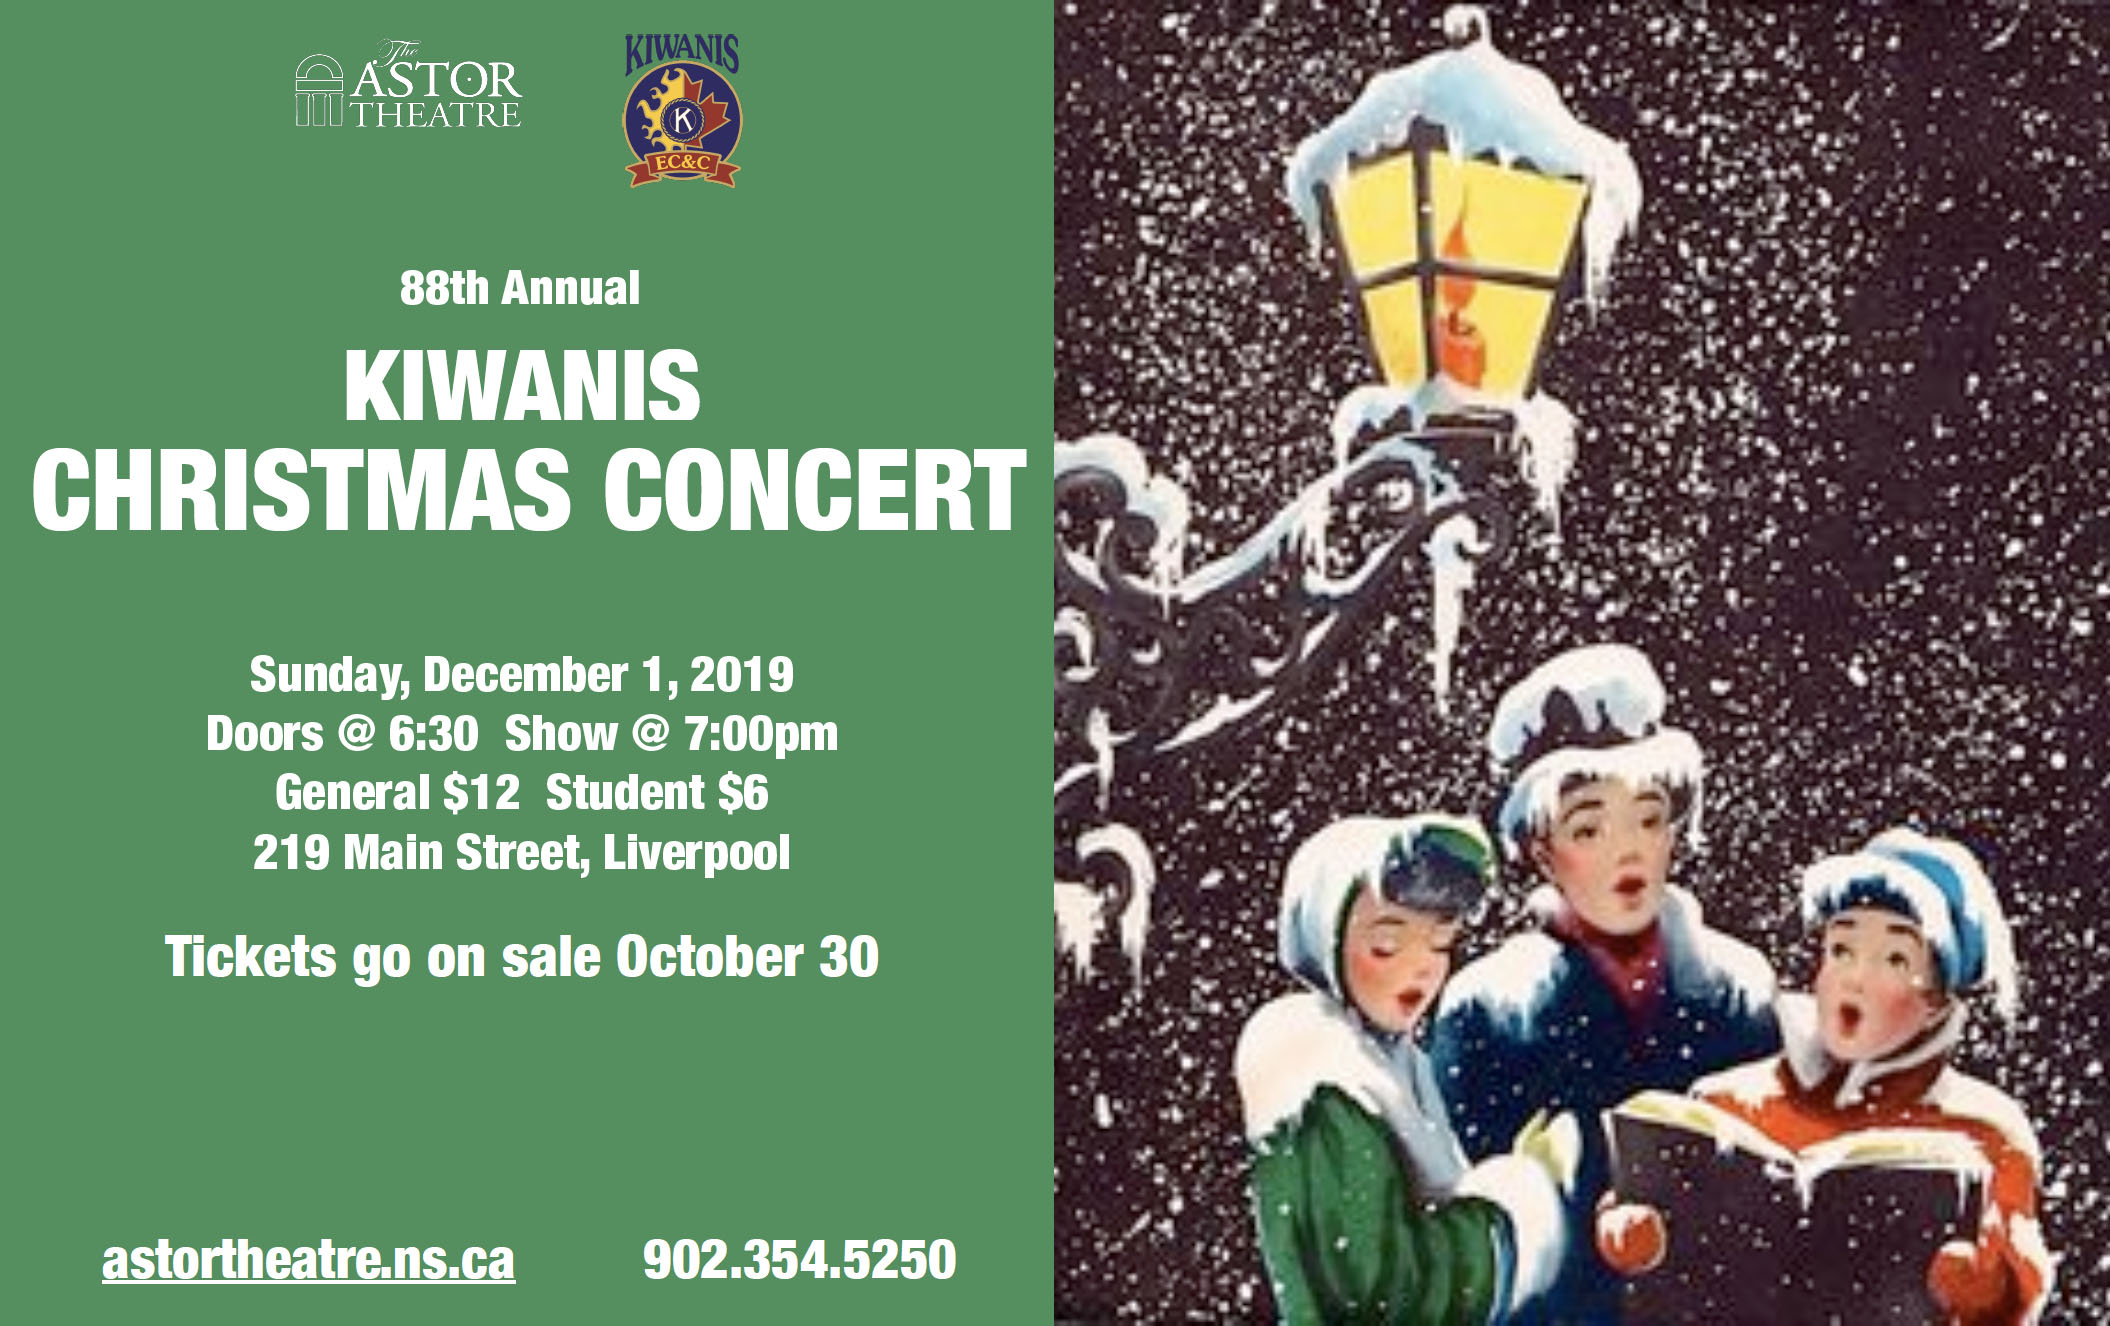 88th Annual Kiwanis Christmas Concert @ Astor Theatre